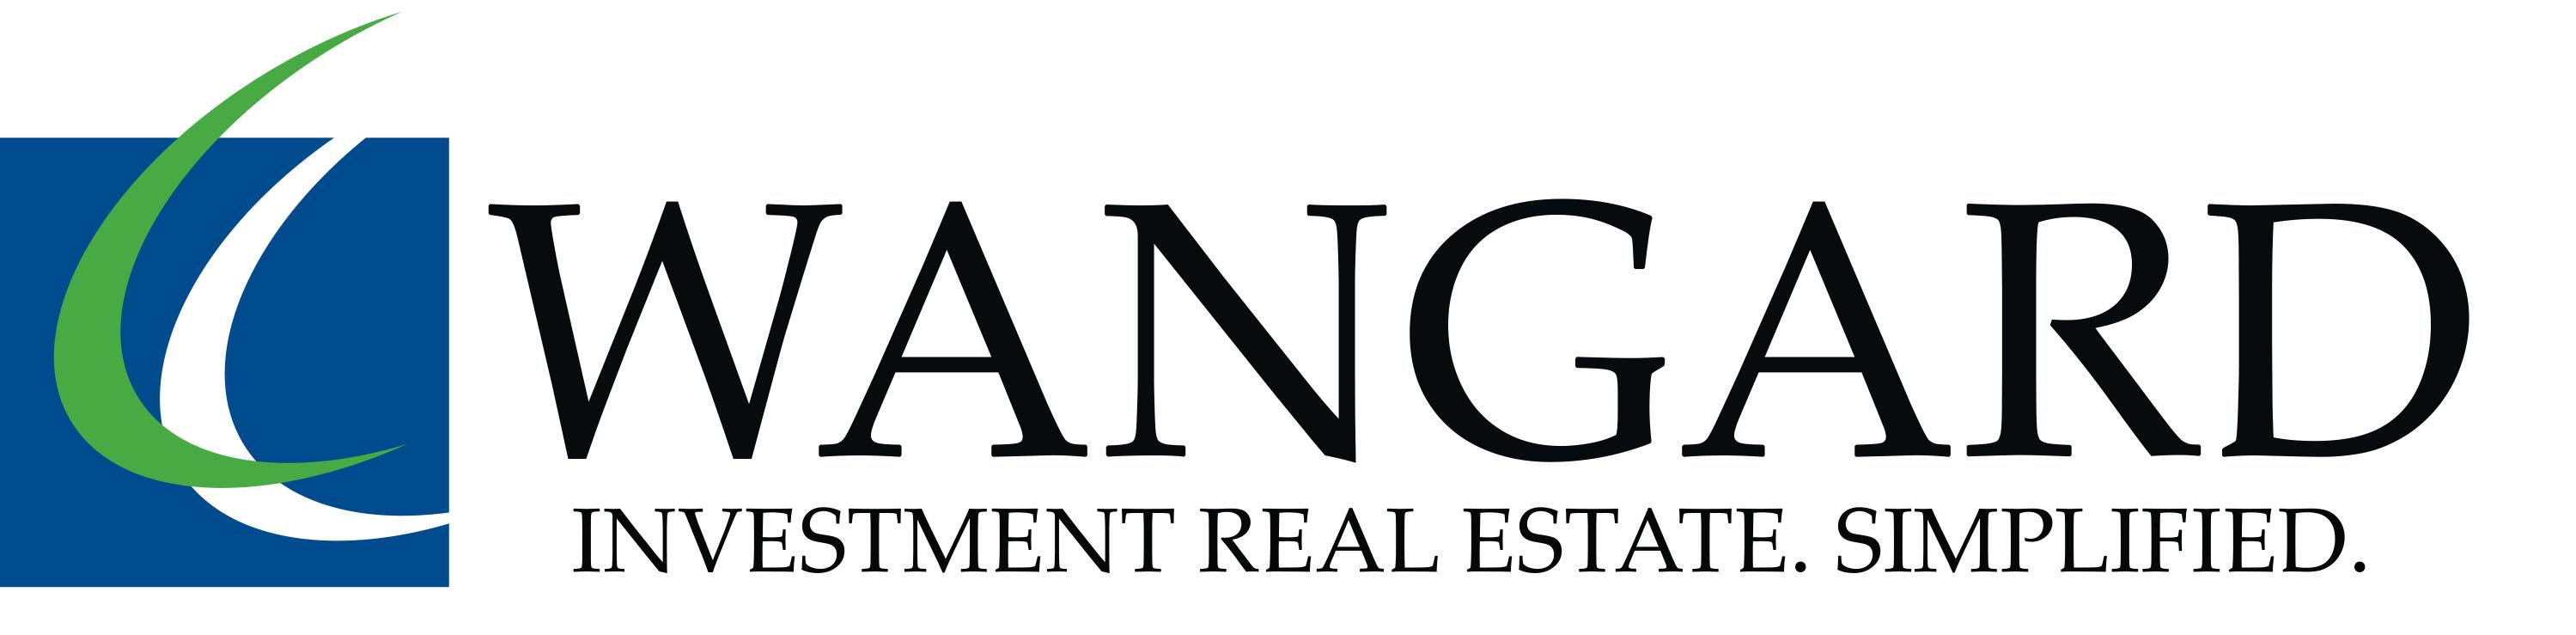 WANGARD_logo